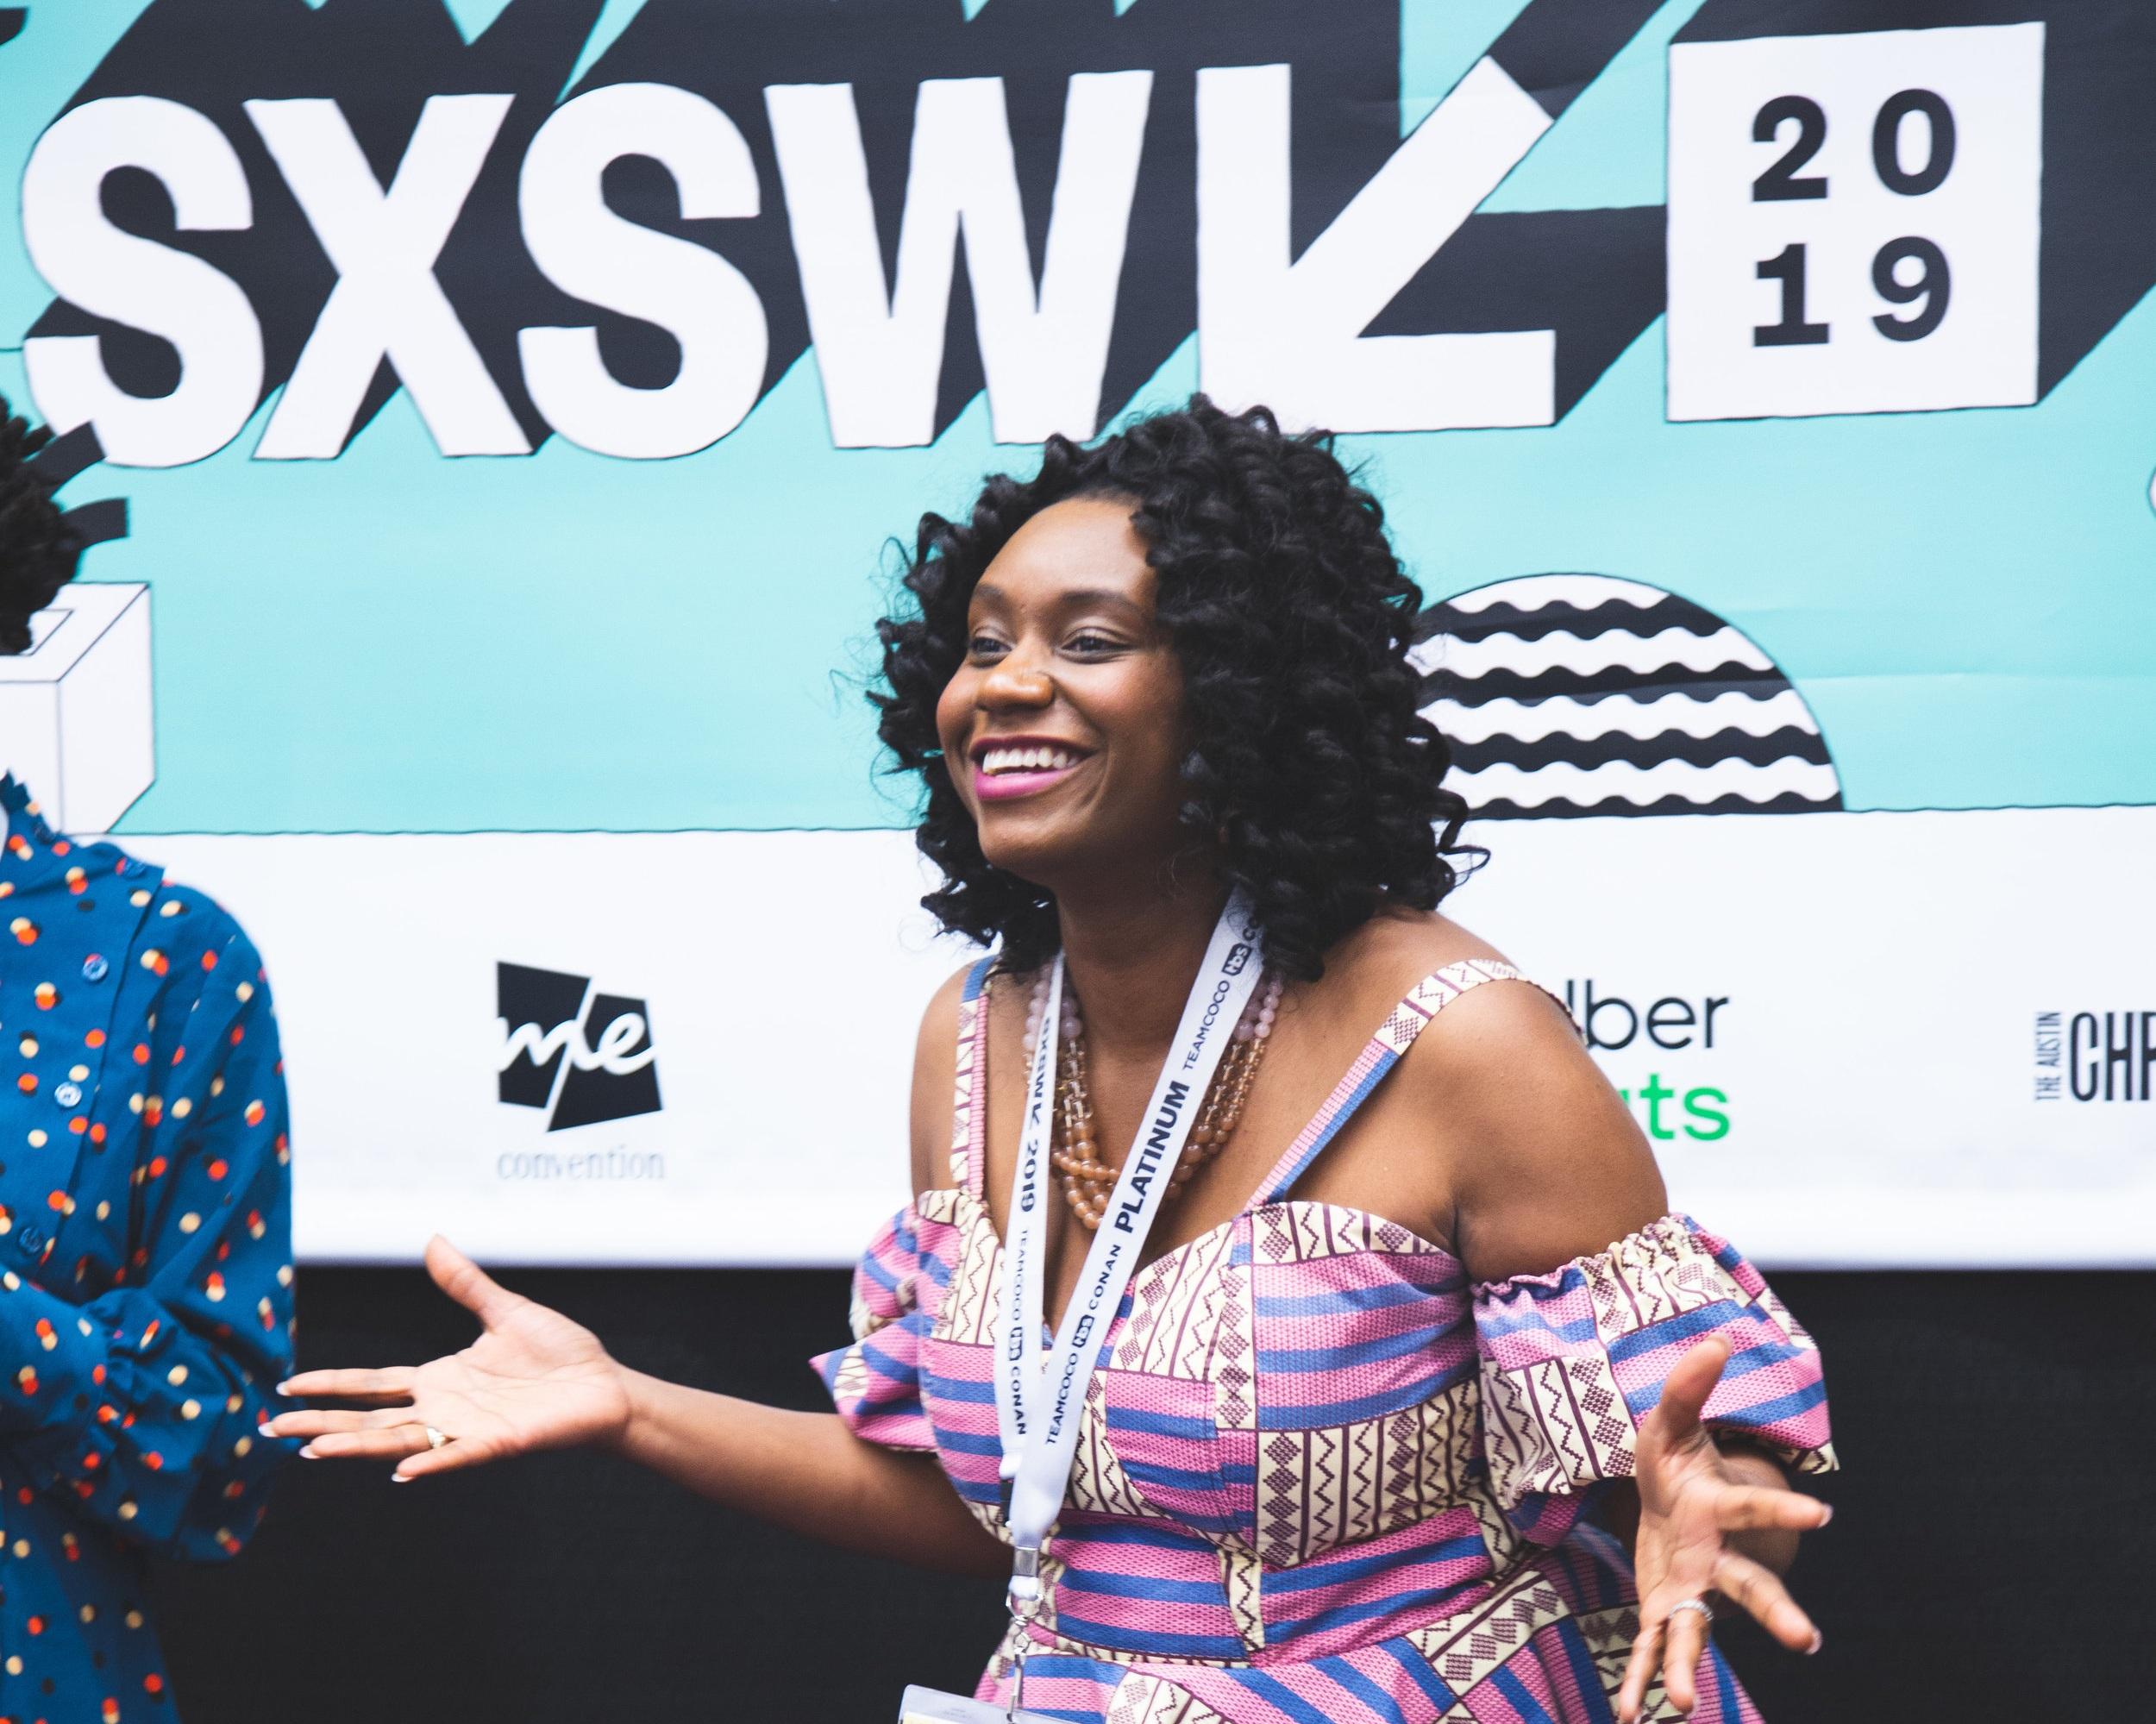 Speaking at SXSW 2019 in Austin Texas.